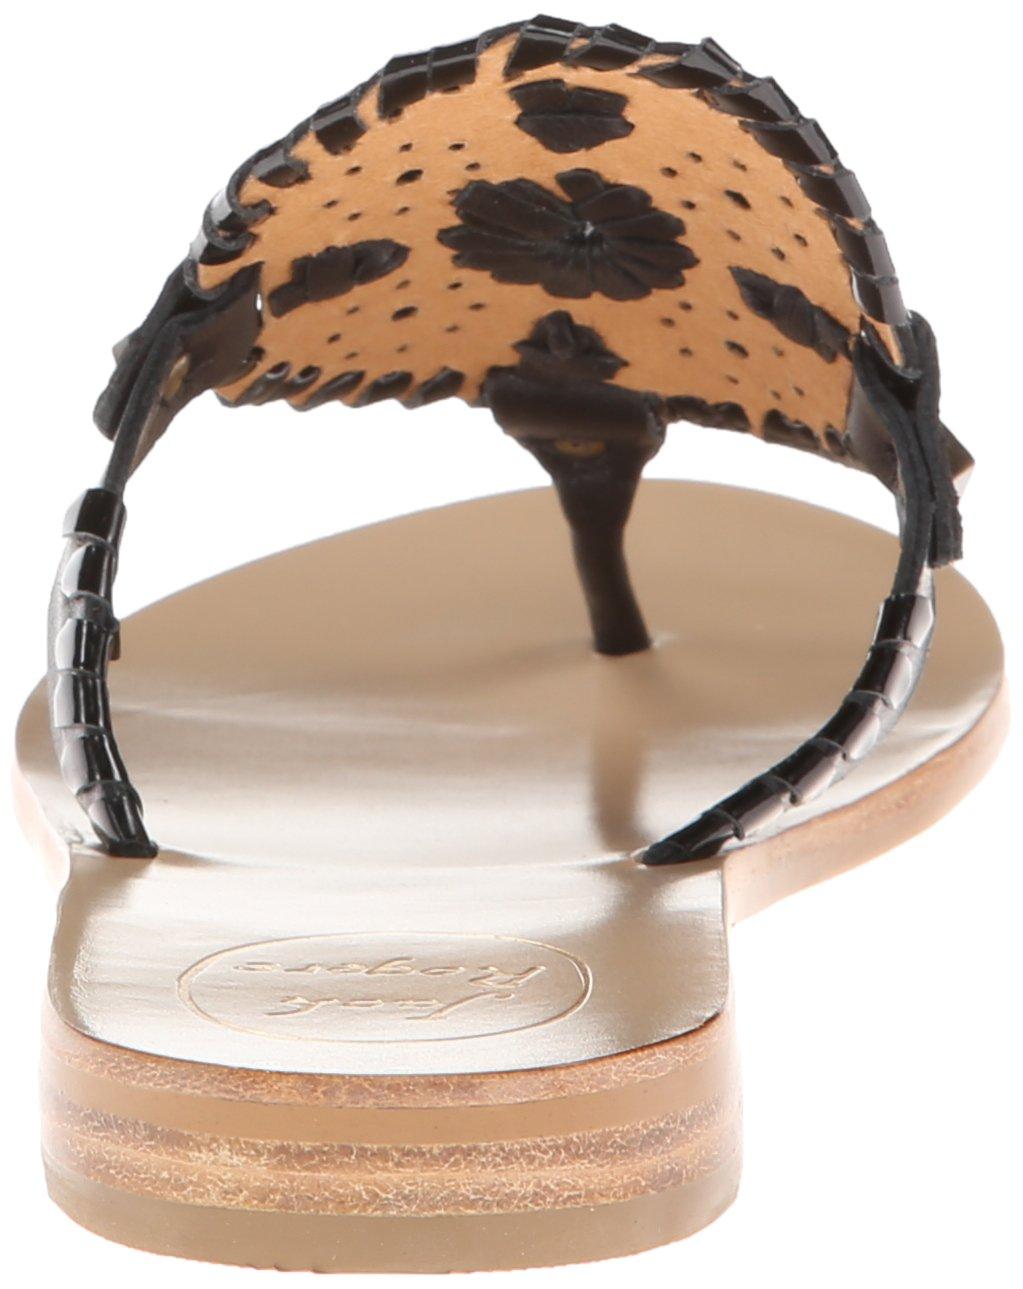 Jack Rogers Women's Georgica Sandal,Black/Black Patent,7 M US by Jack Rogers (Image #2)